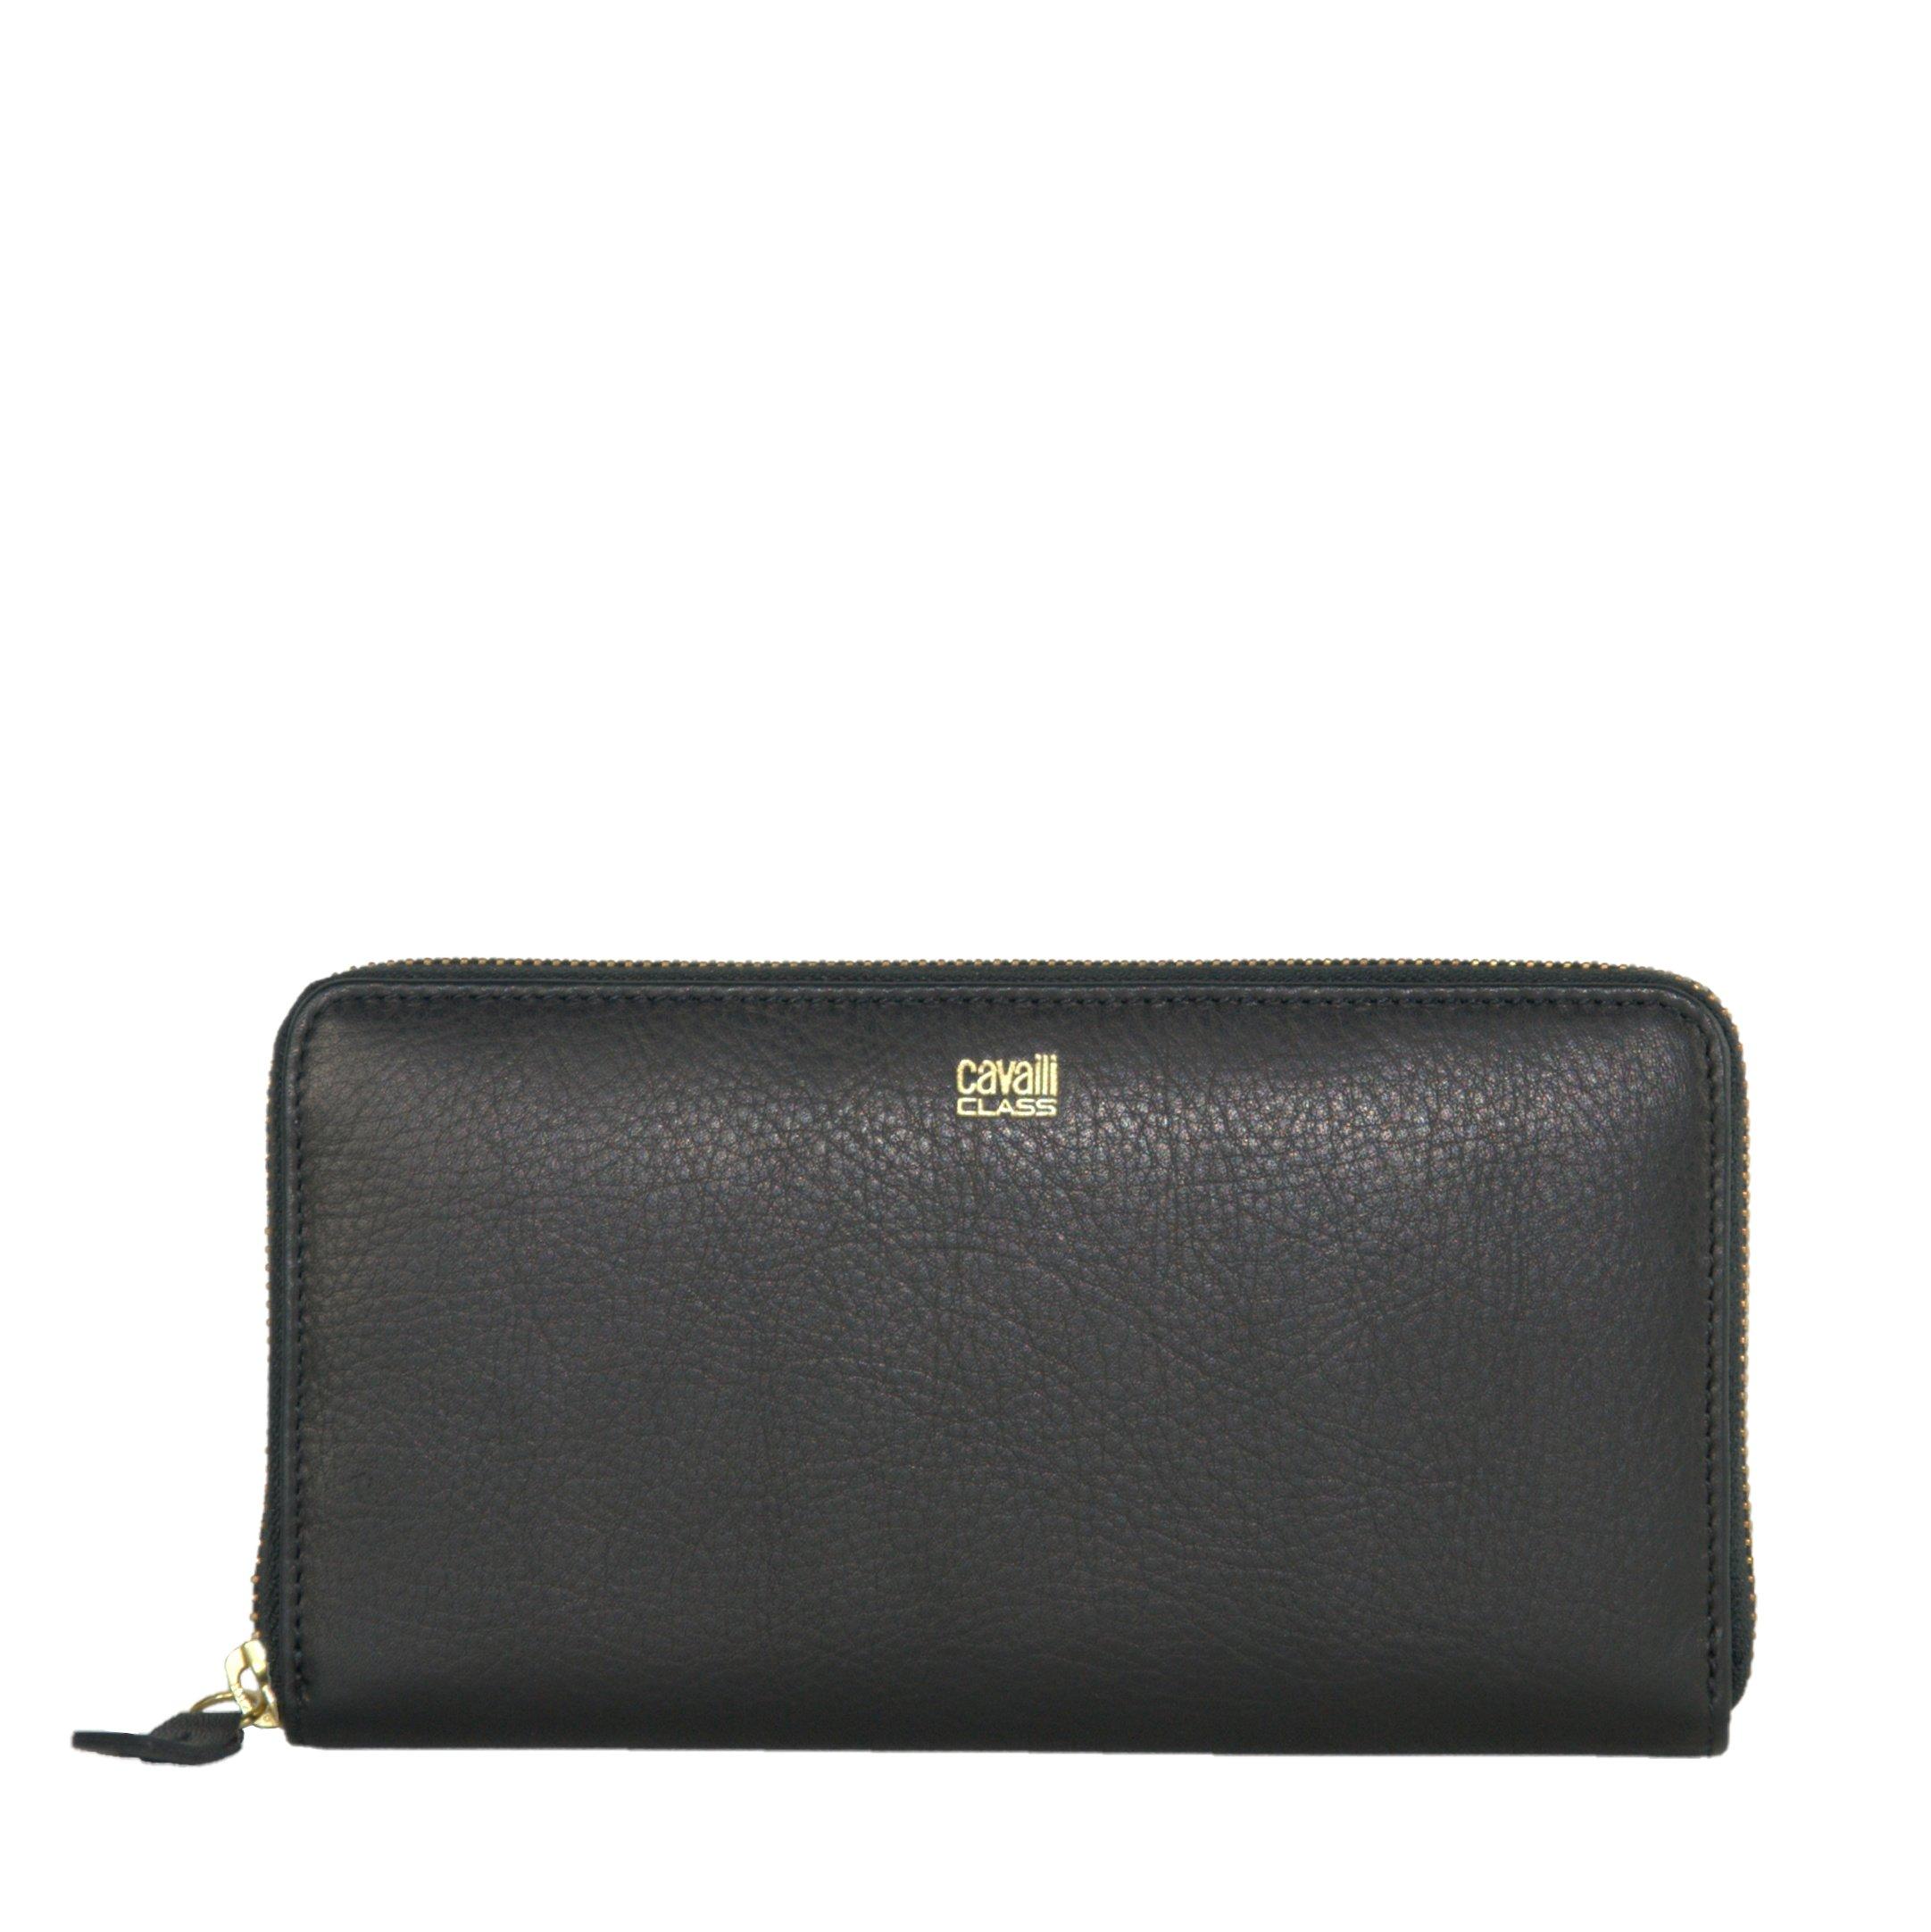 Cavalli Class Women's Wallet Black CA1432609